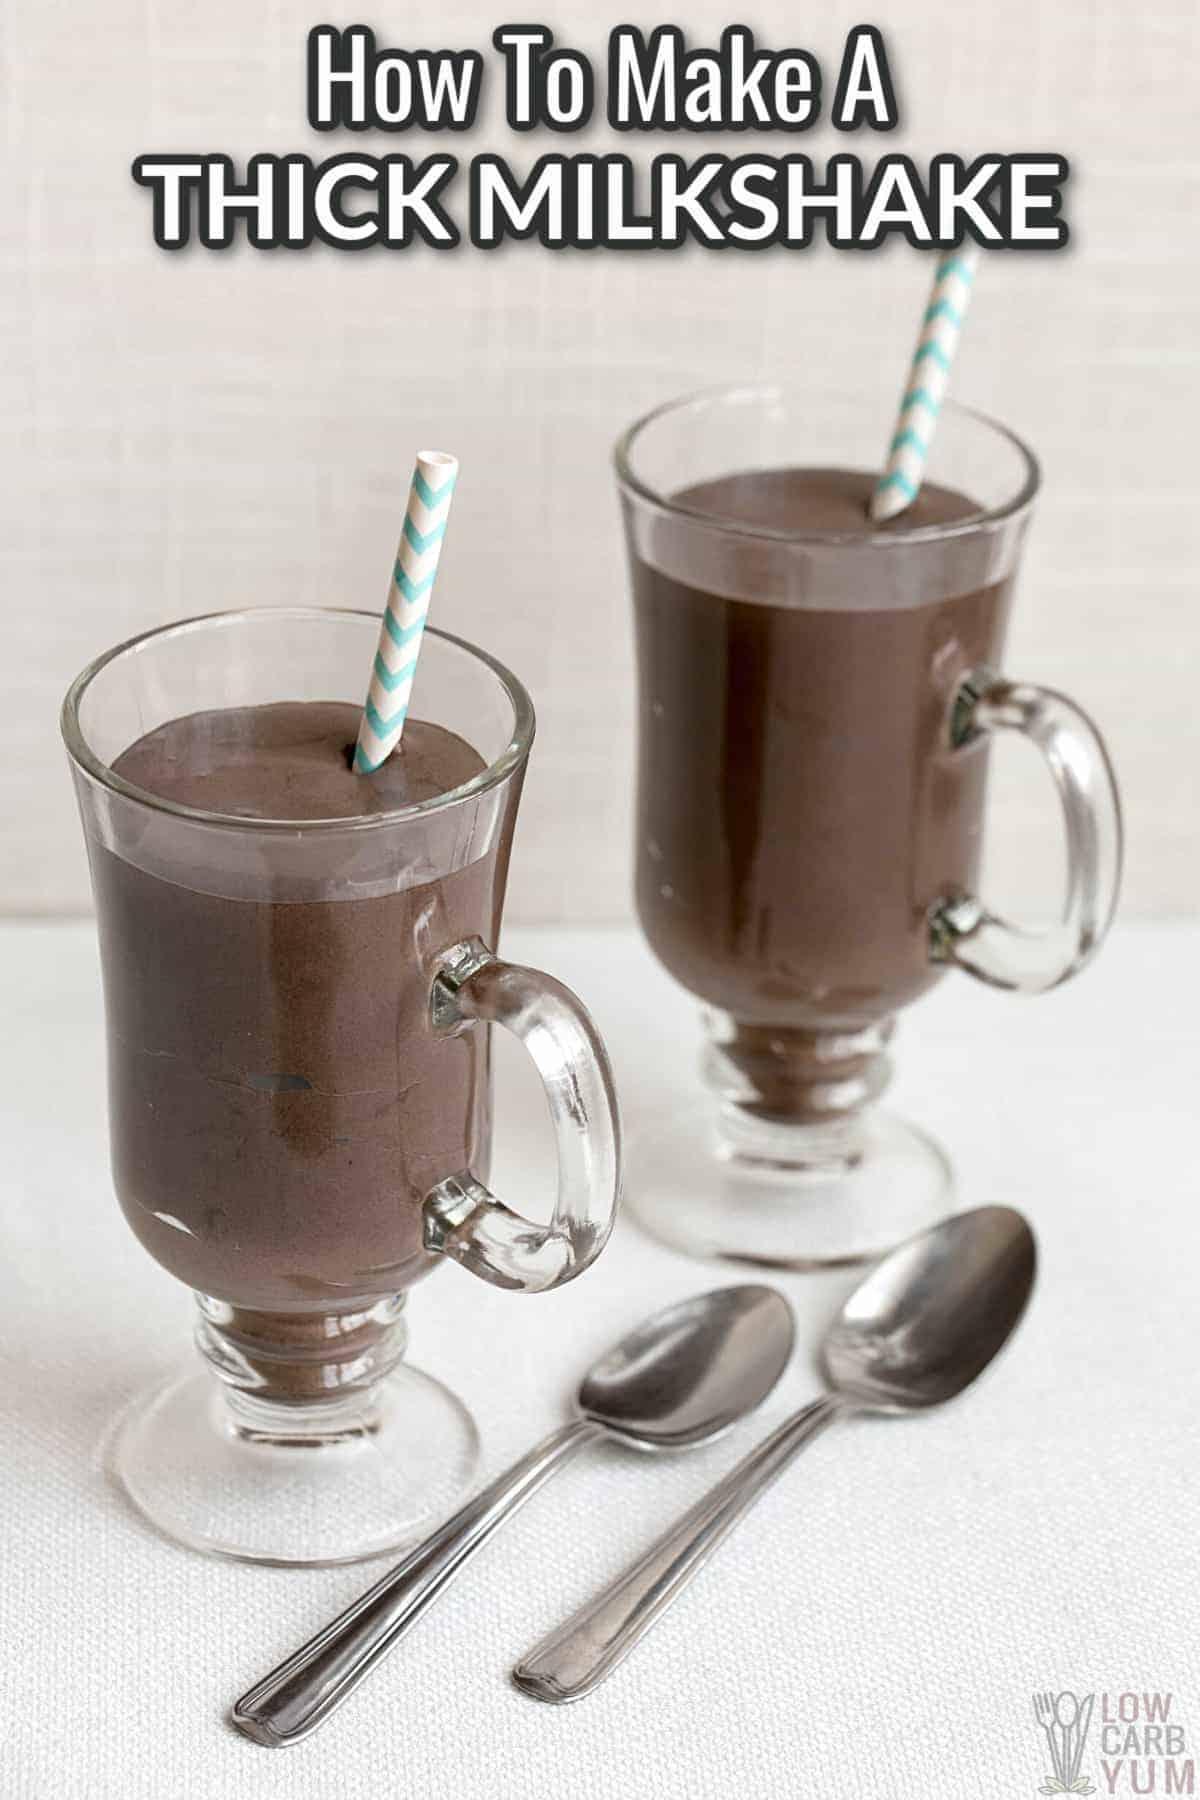 how to make a thick milkshake cover image